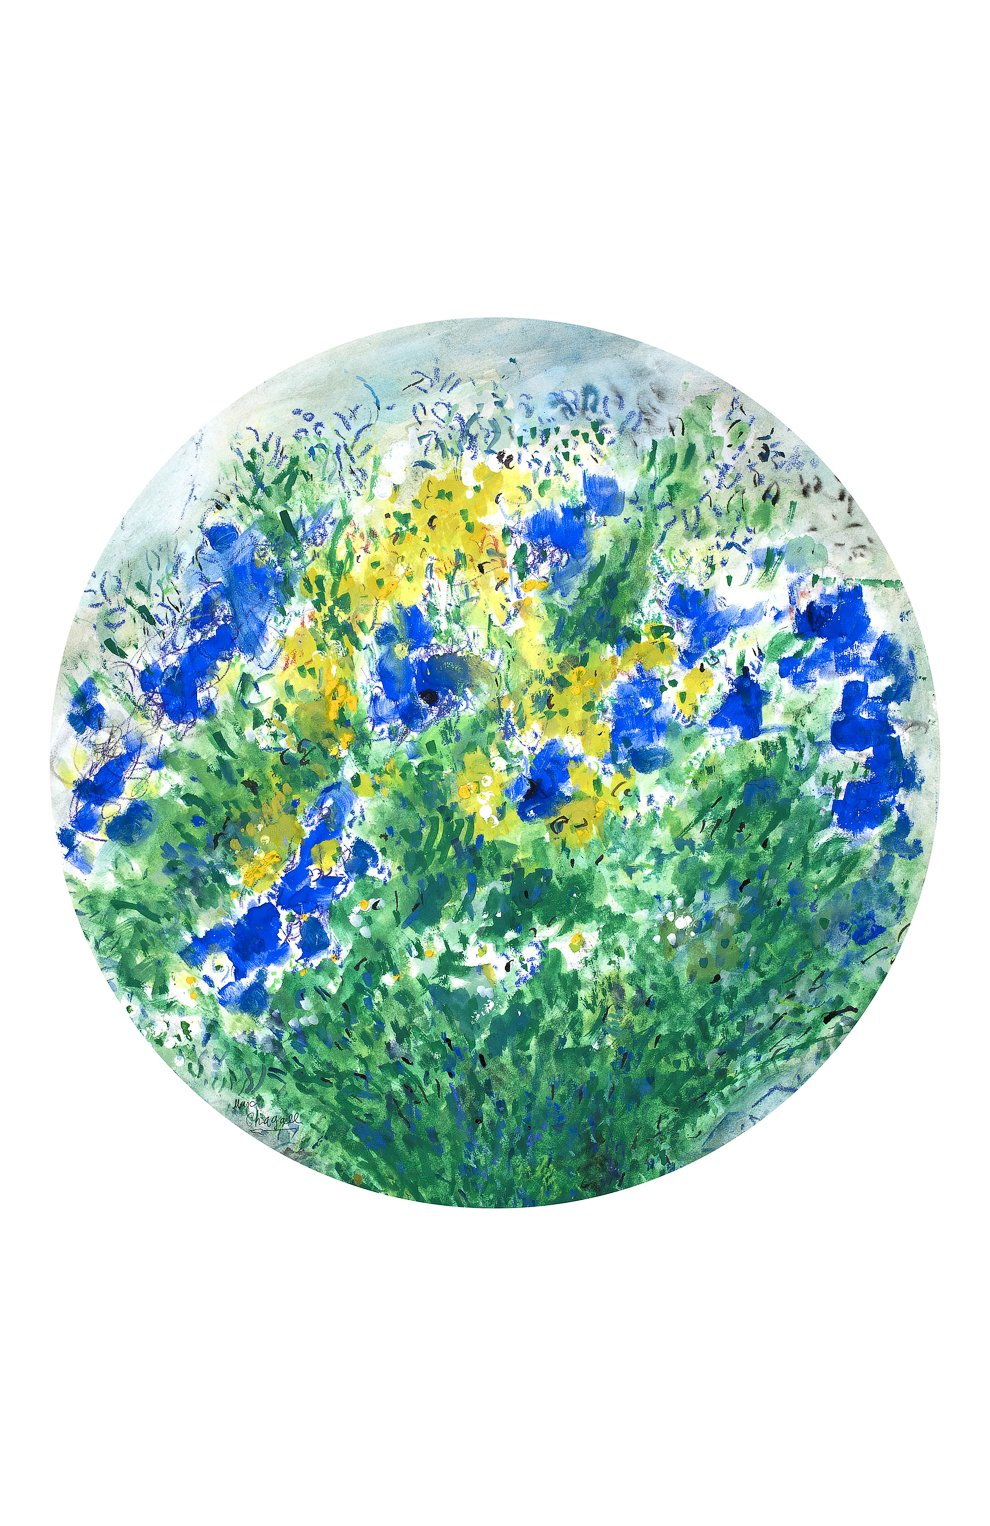 Блюдо Les Bouquets de Fleurs de Marc Chagall    Фото №1